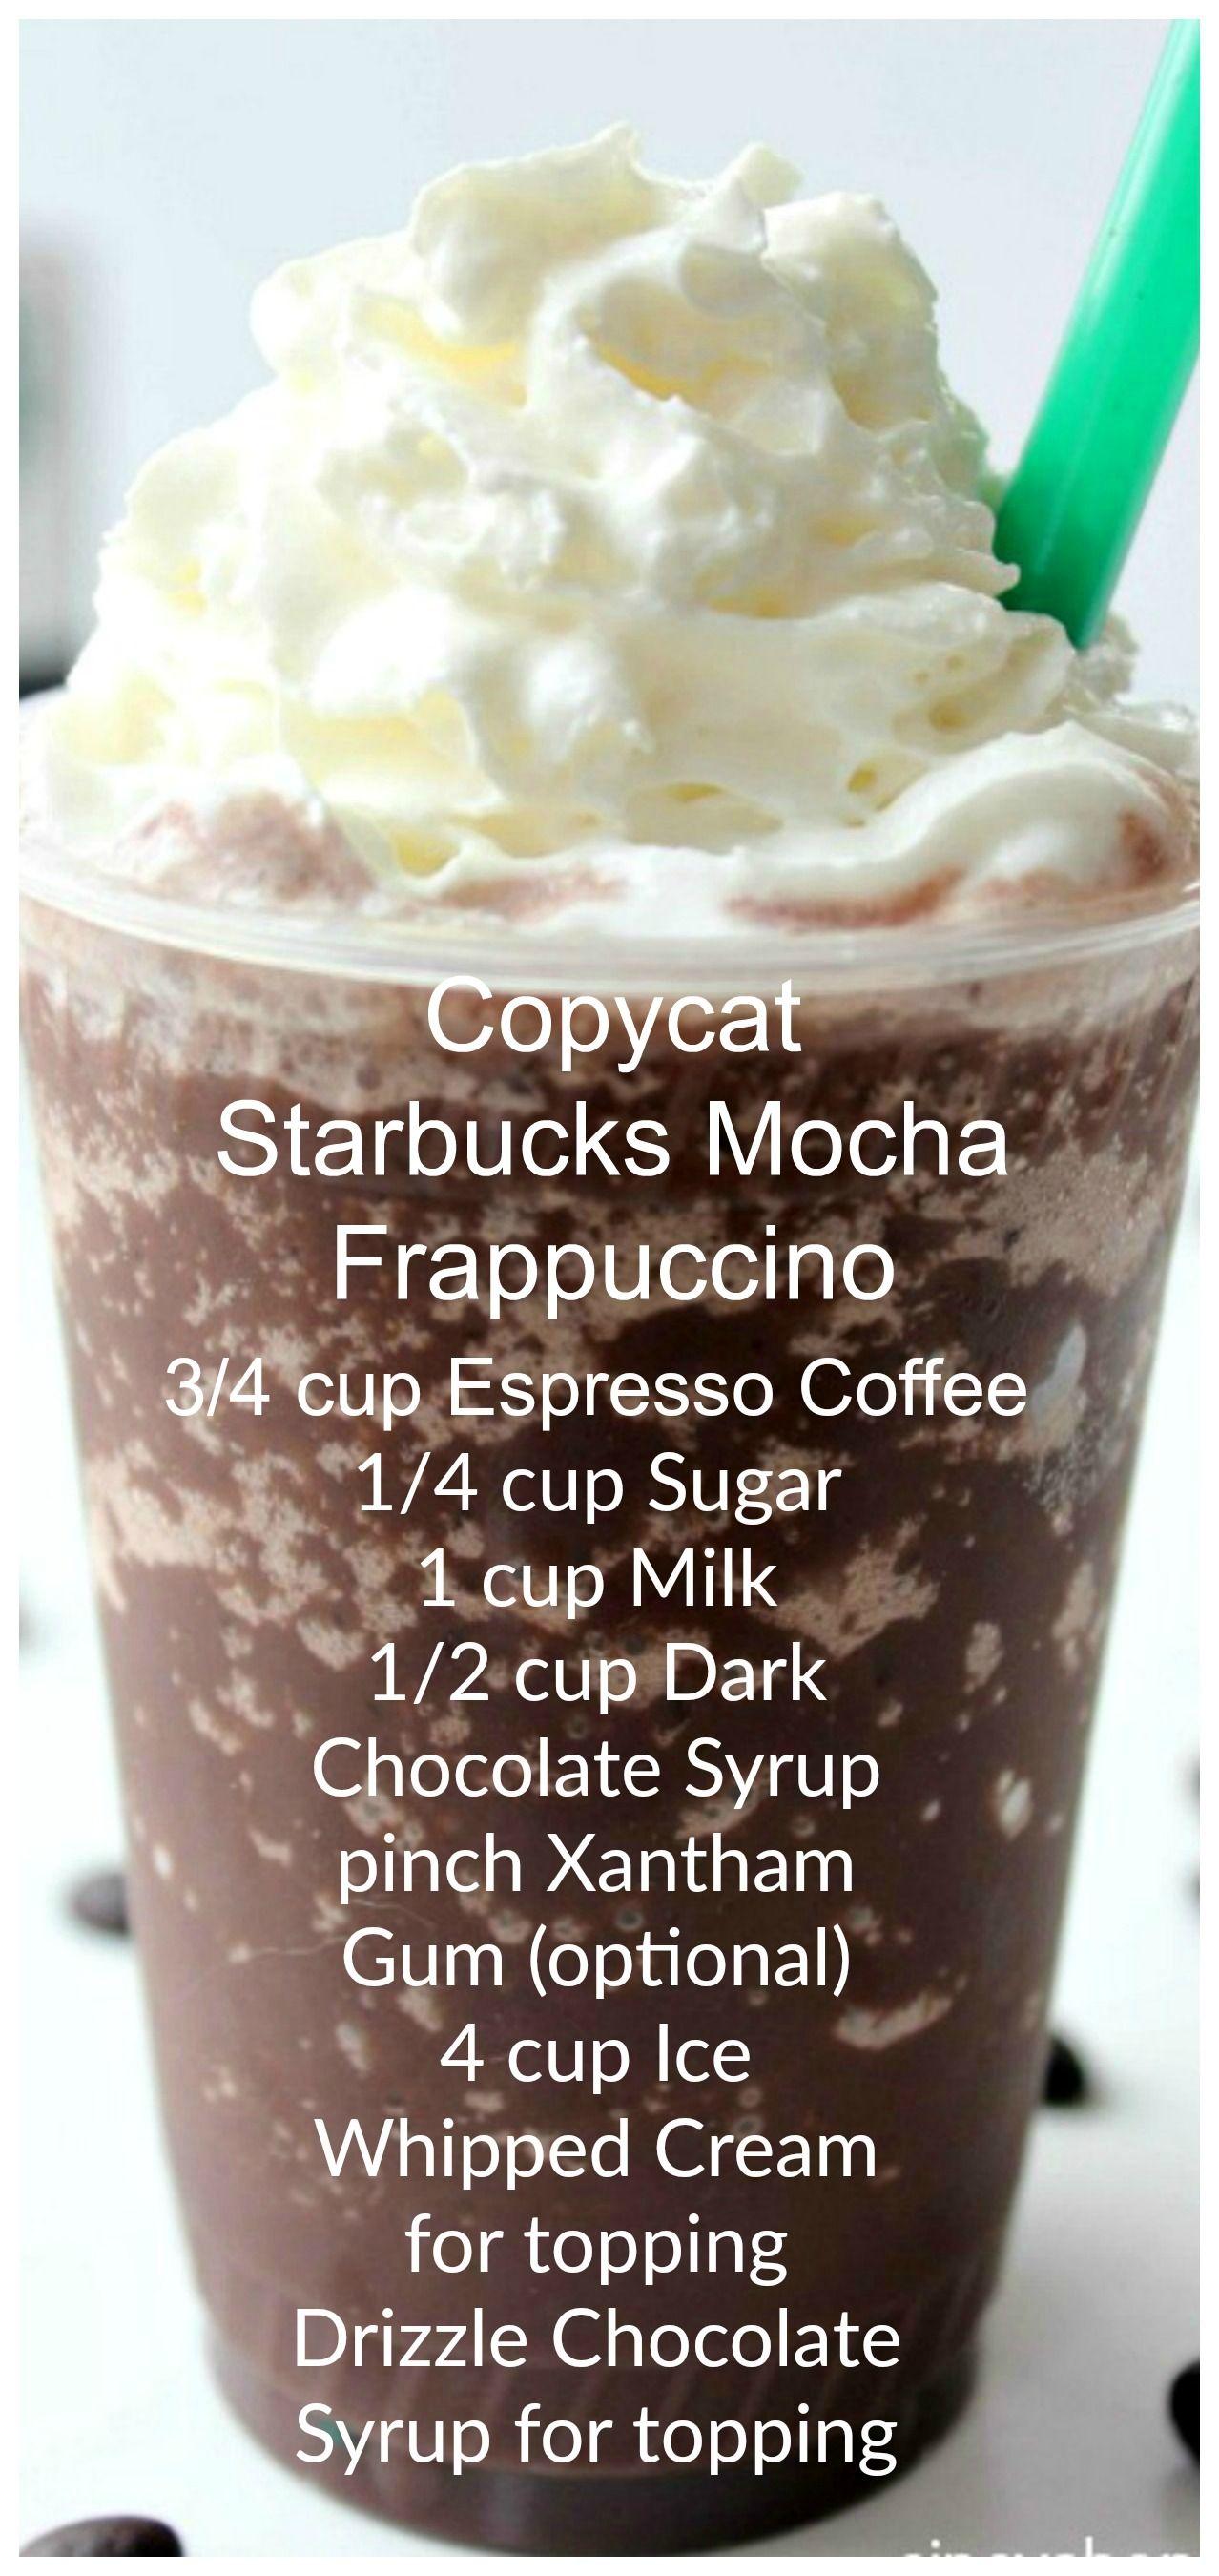 Copycat Starbucks Mocha Frappuccino Recipe Starbucks Recipes Starbucks Drinks Recipes Copycat Starbucks Recipes